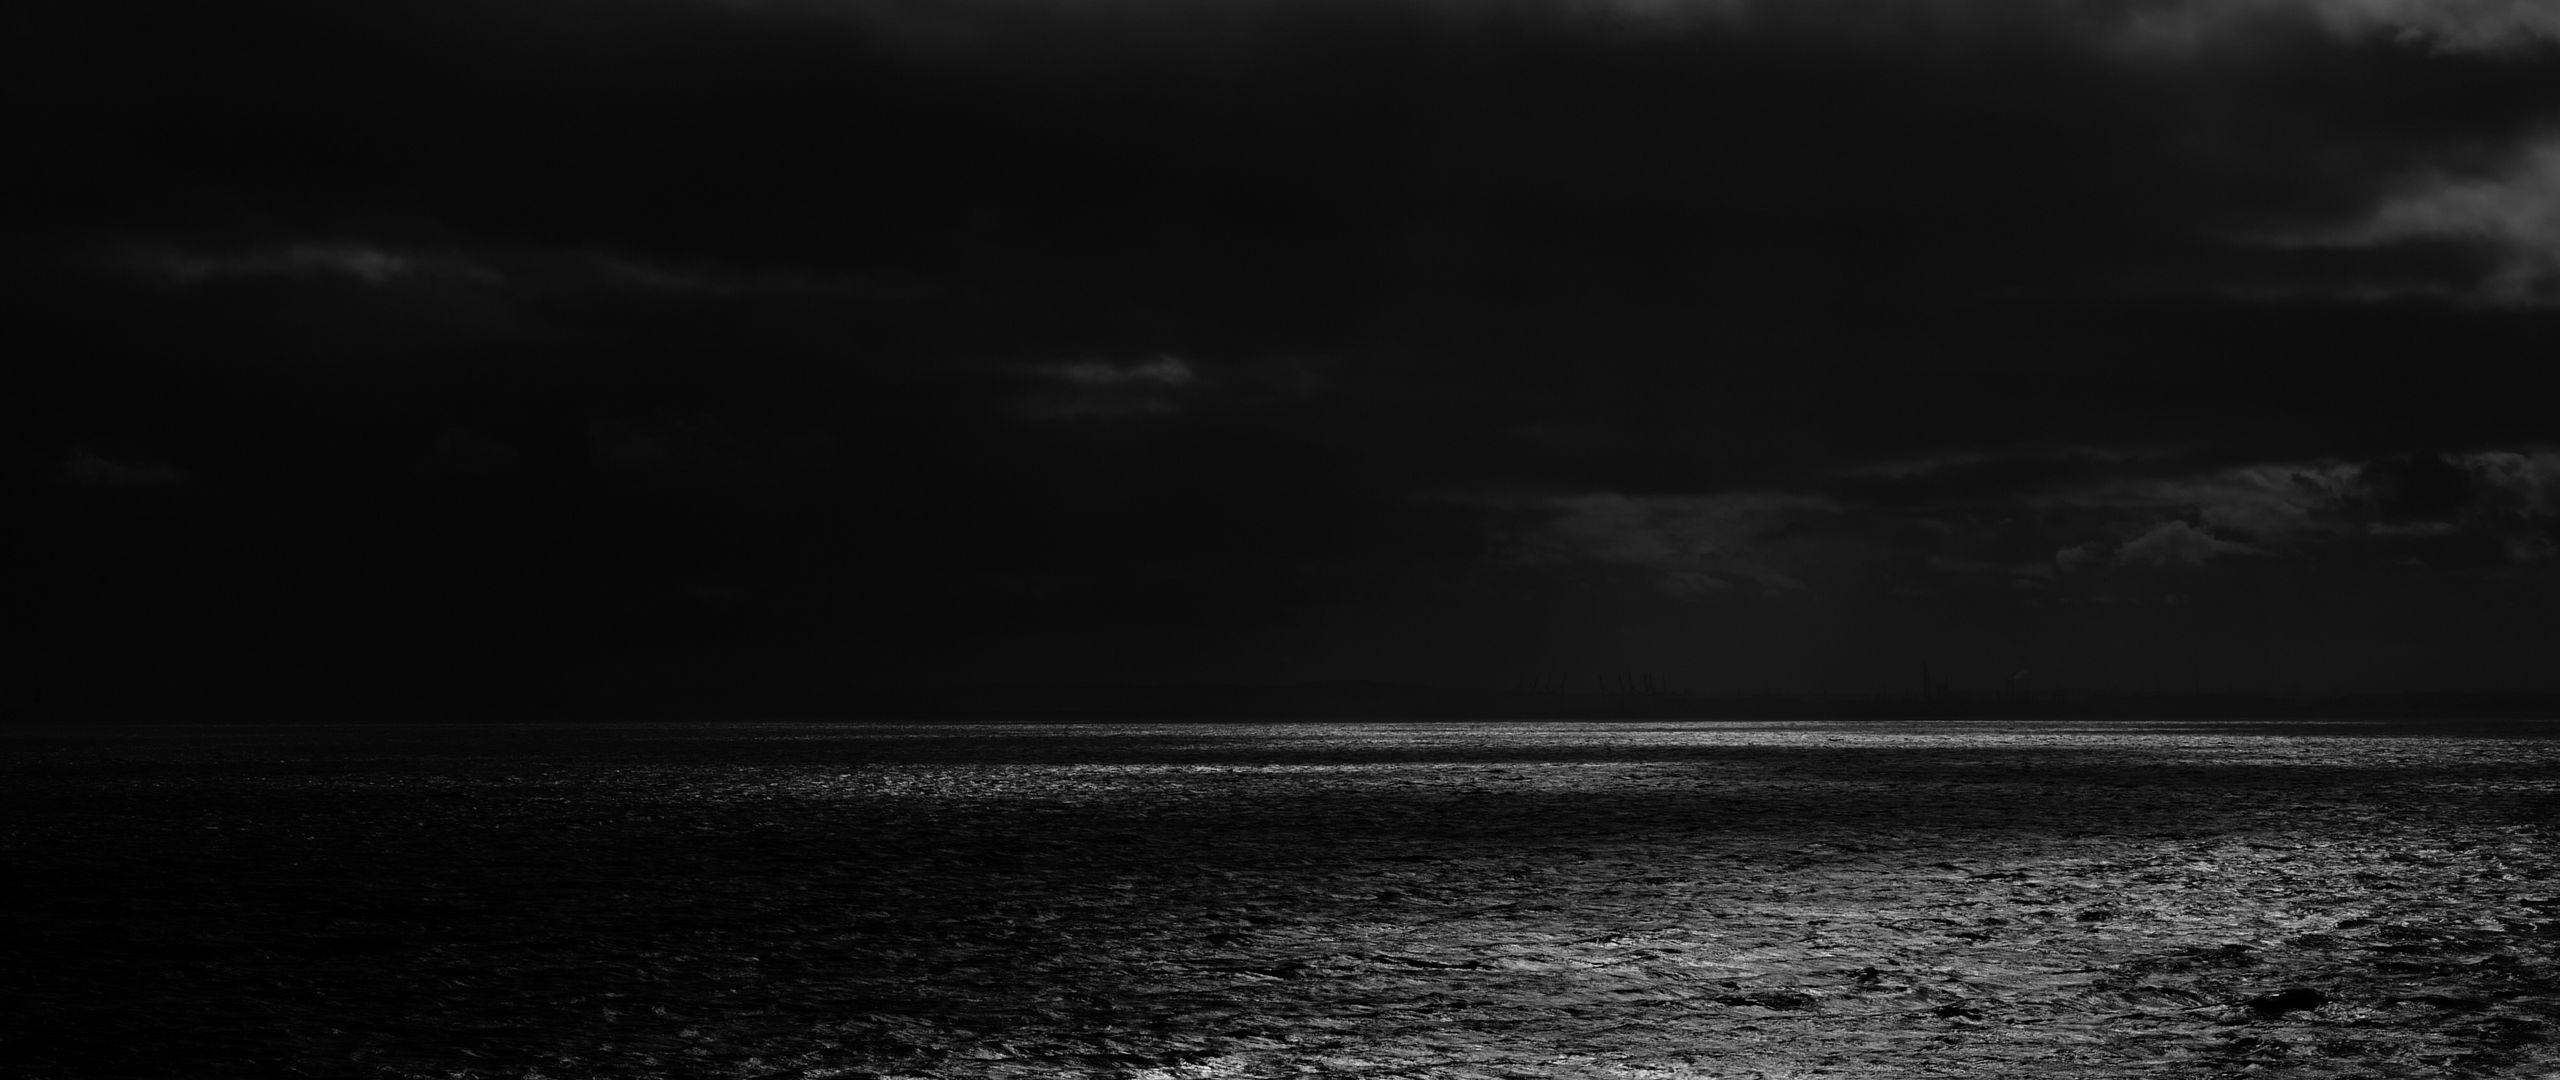 2560x1080 Wallpaper sea, horizon, bw, overcast, clouds, ripples